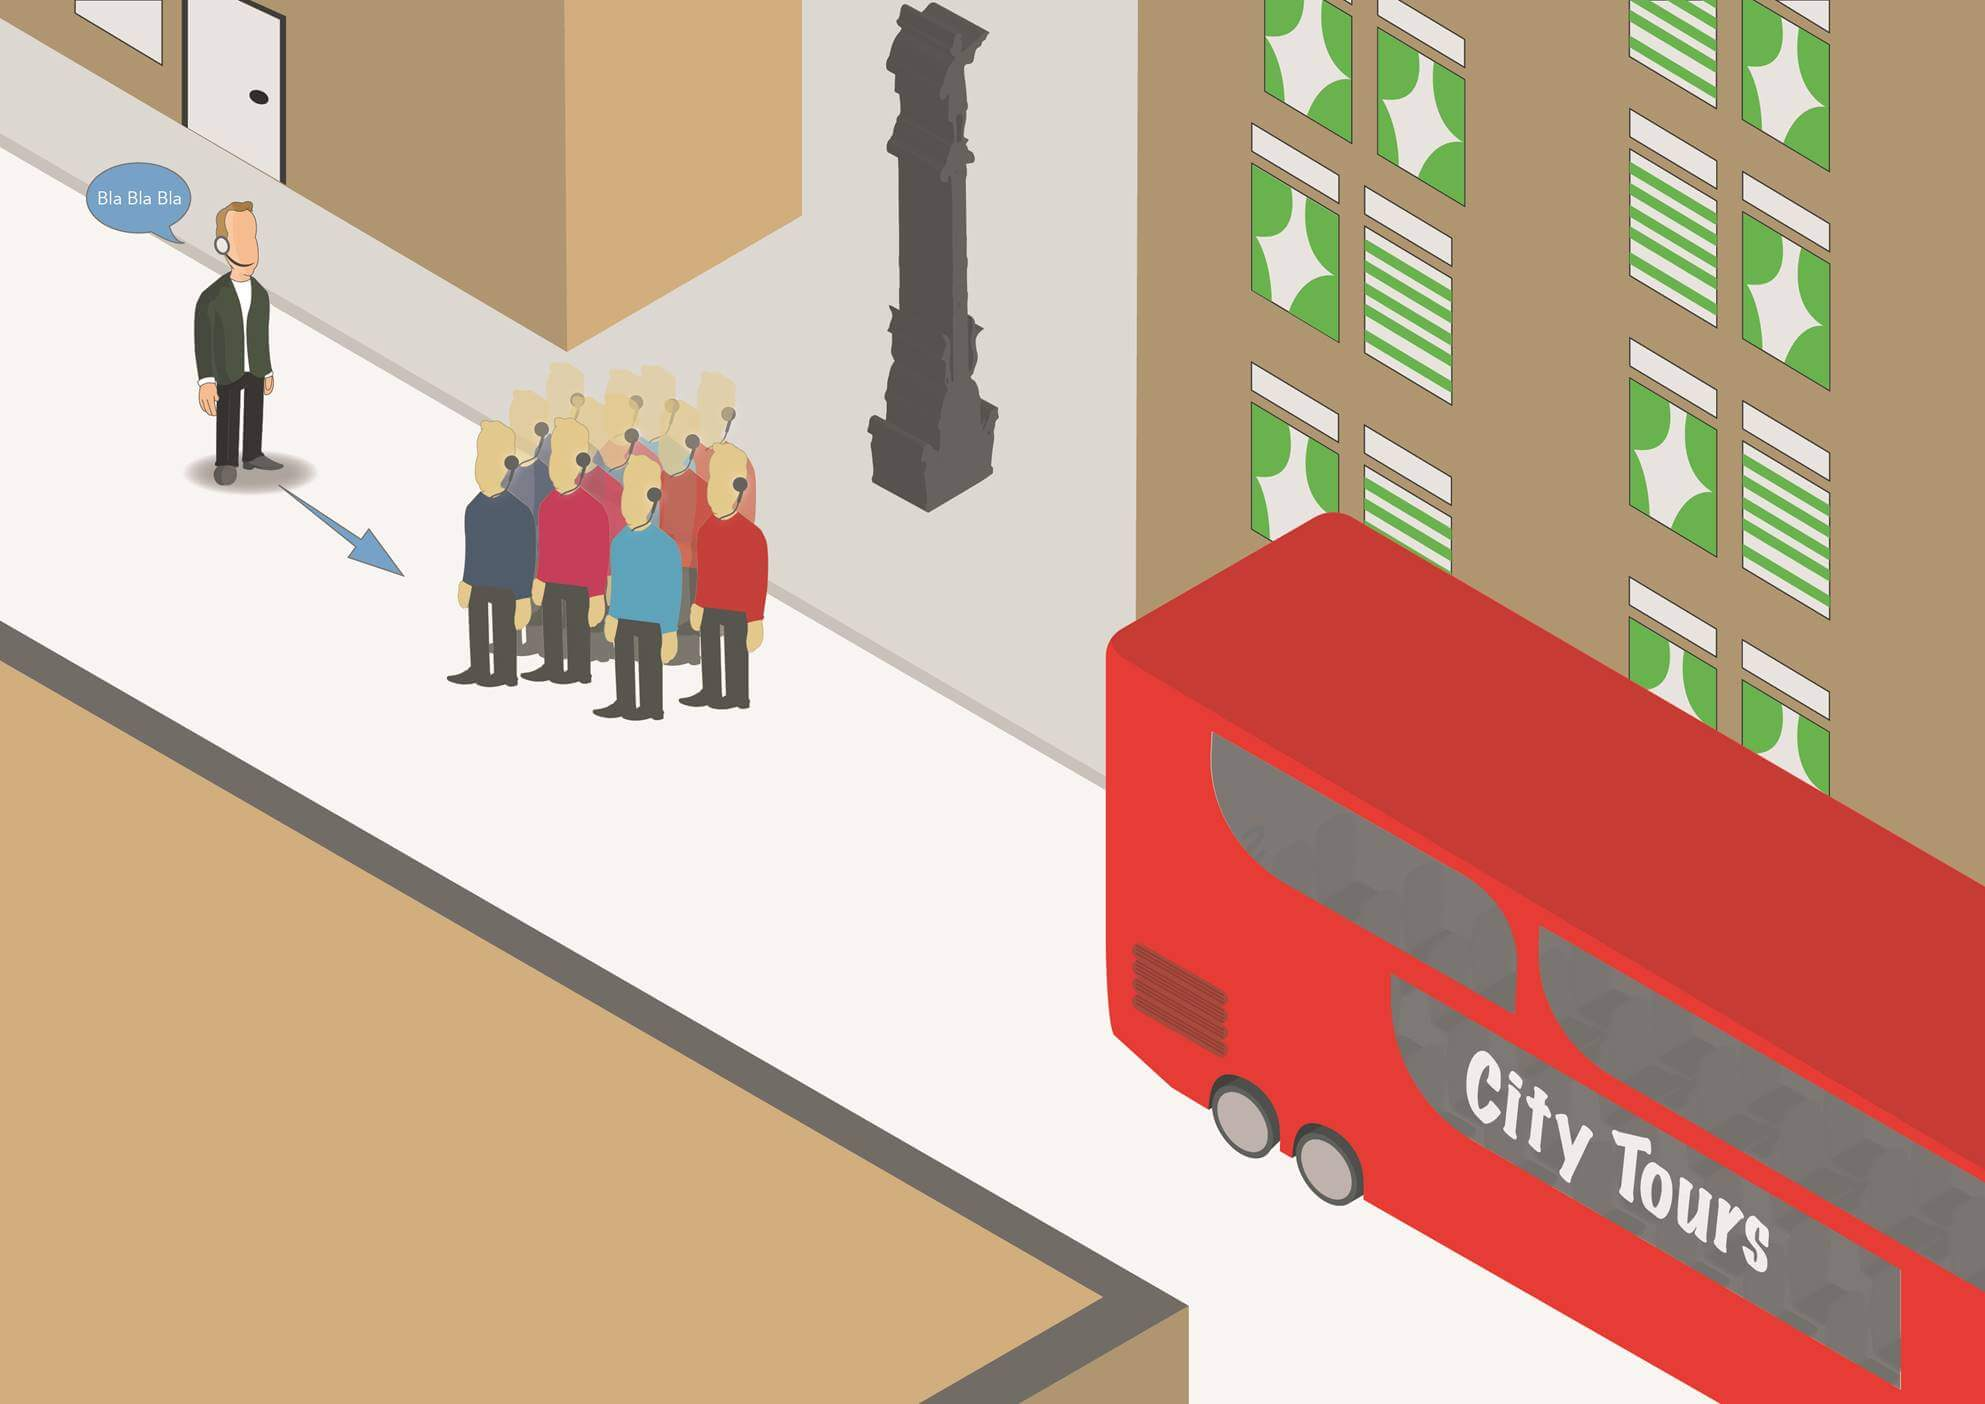 axitour-communication-systems-communicatie-systemen-city-tours-stadsrondleiding